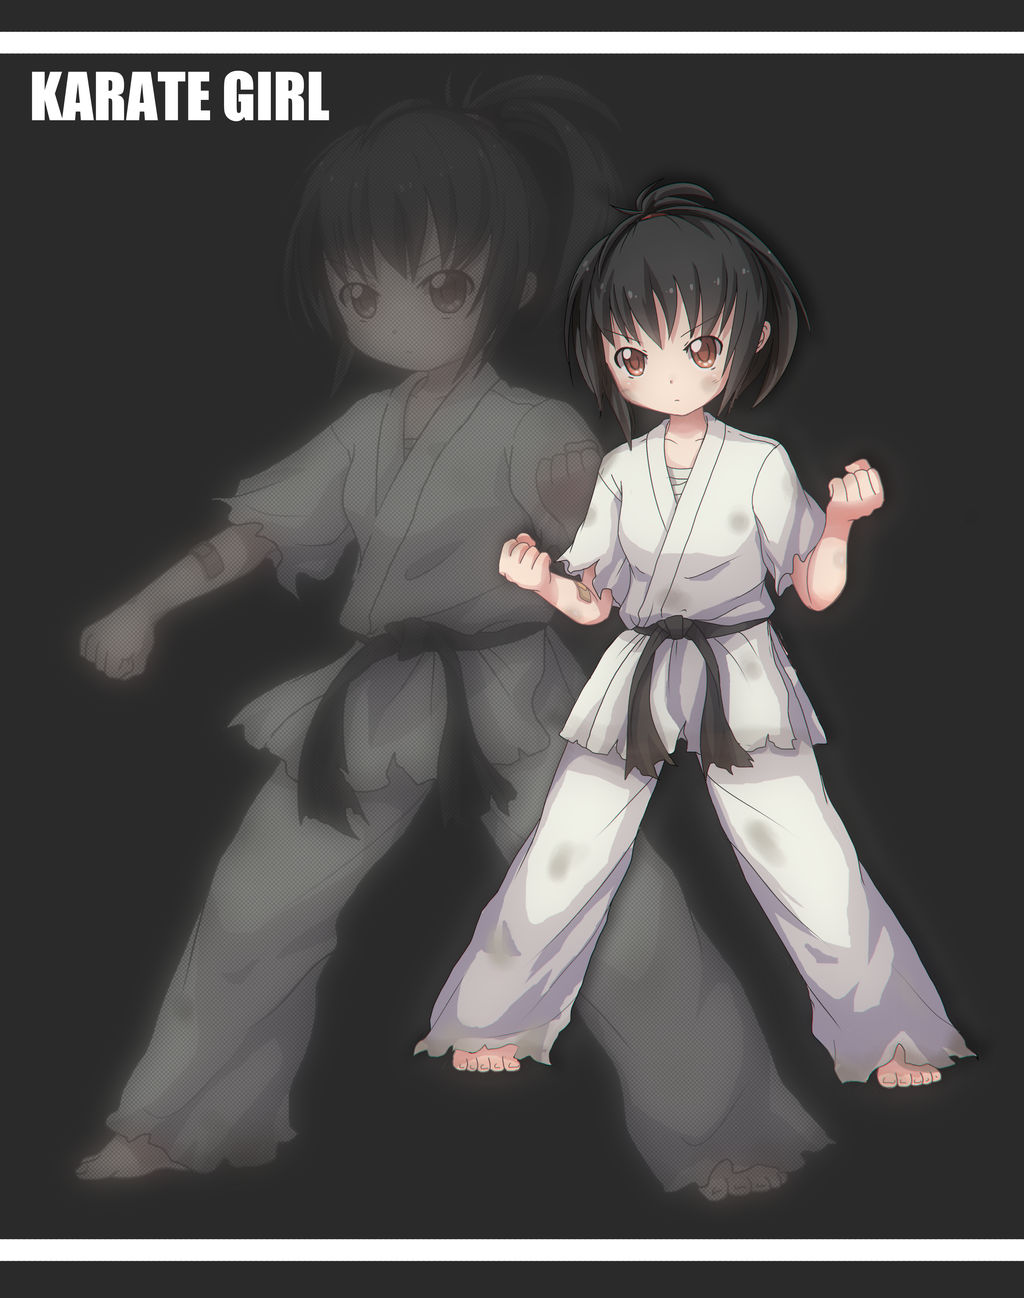 Karate Girl By Sdgundam22455 On Deviantart